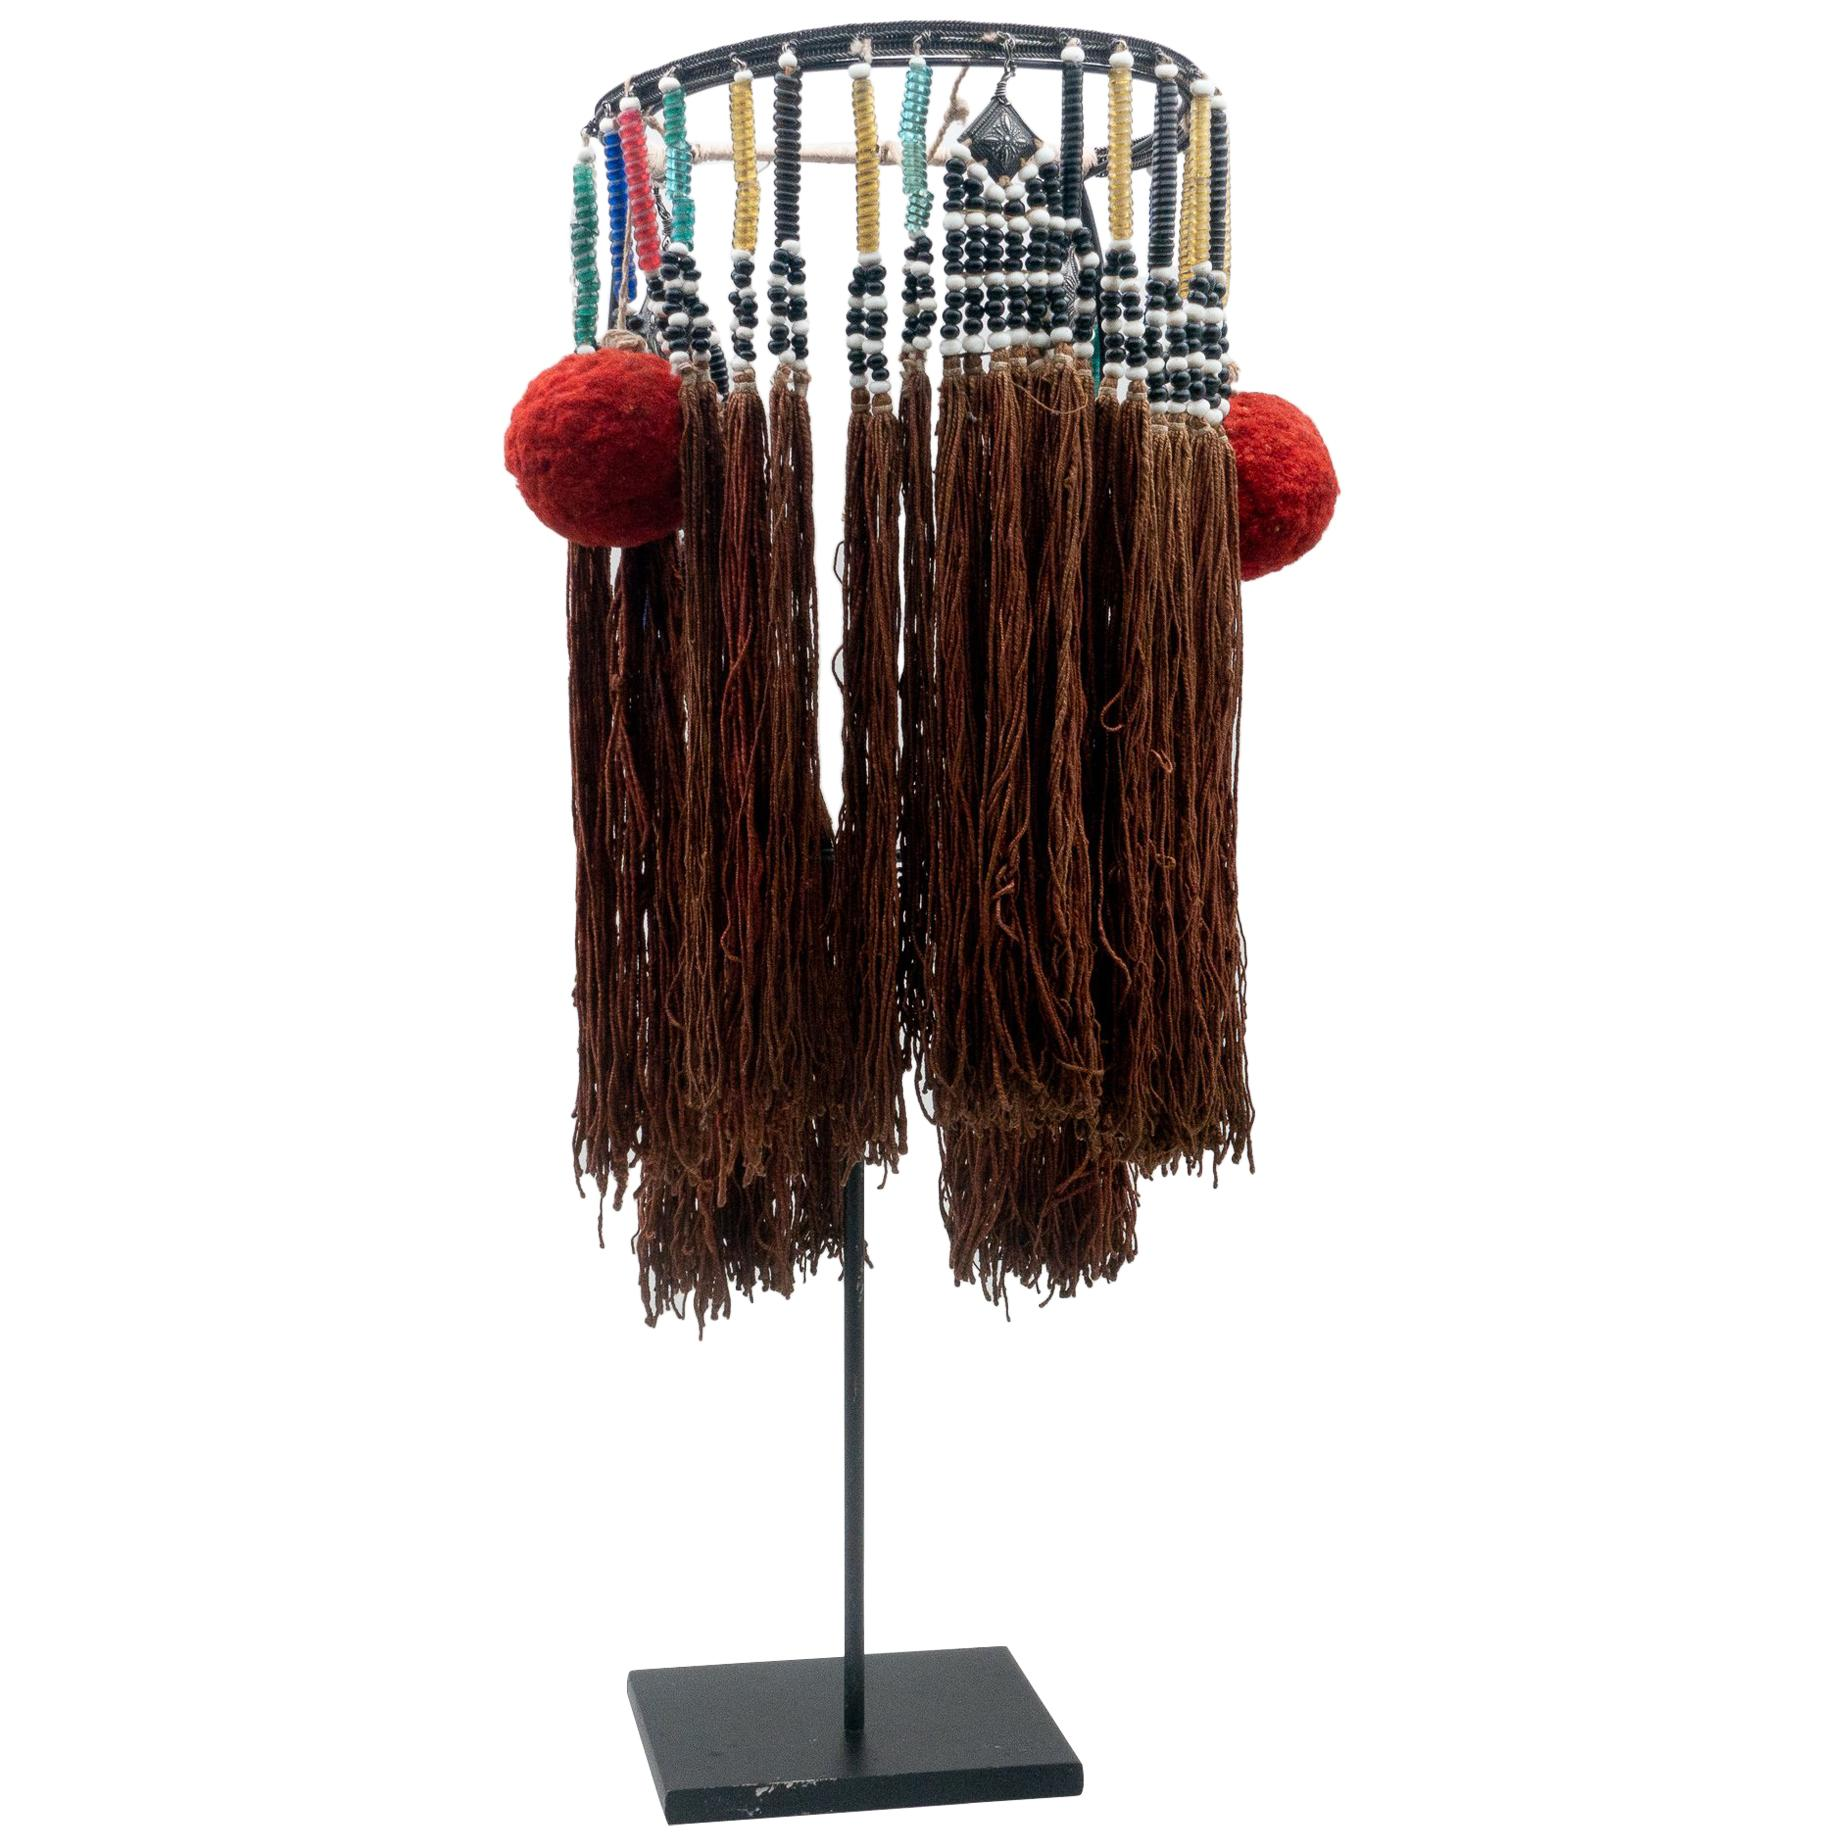 Miao Minority Tribe Headdress, Pom-Poms & Tassels